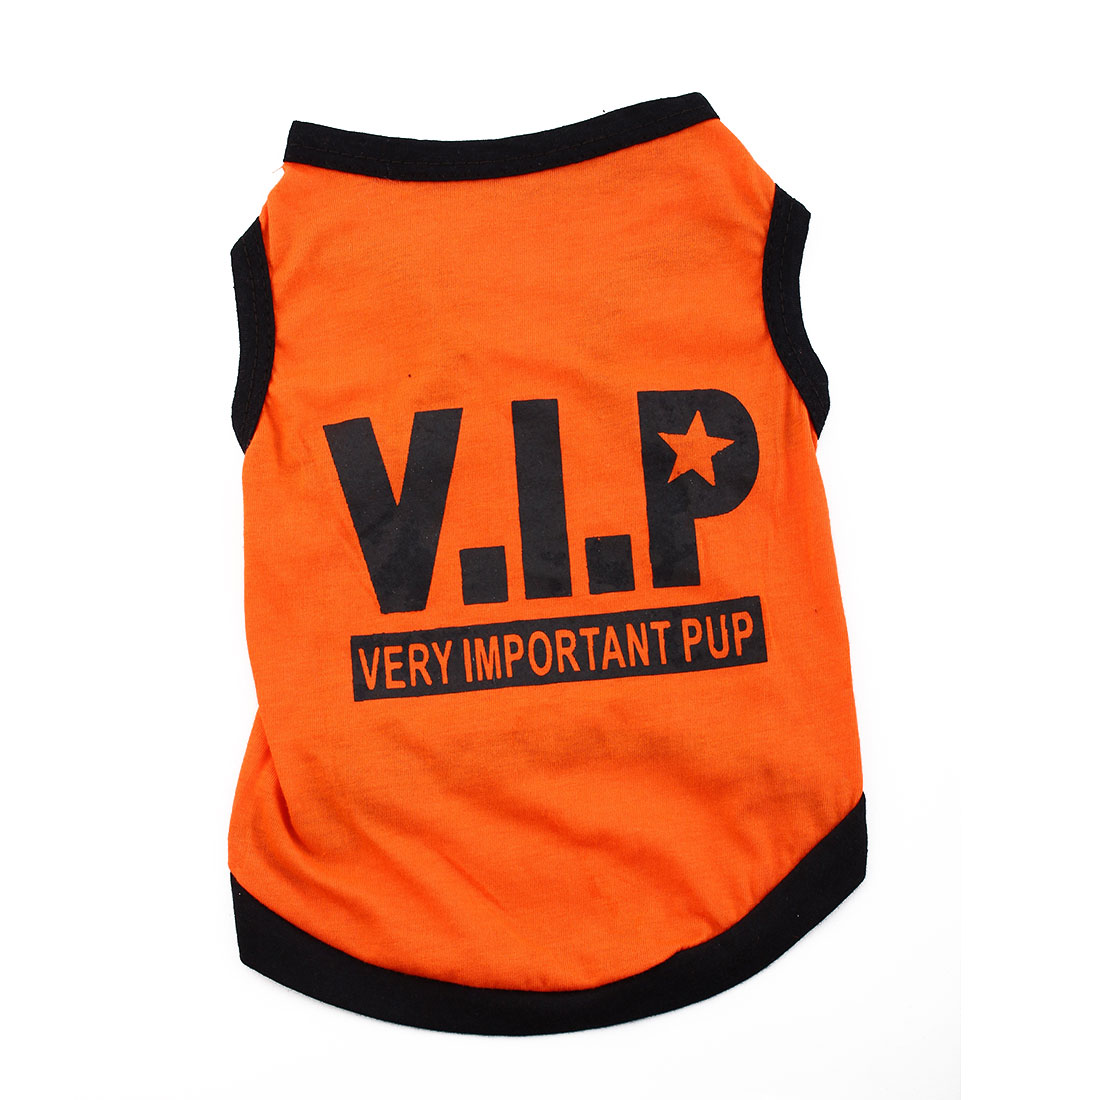 VIP Print Summer Coat Puppy Costume Pet Clothing Small Dog Cat Vest T-shirt Tee Orange Size L